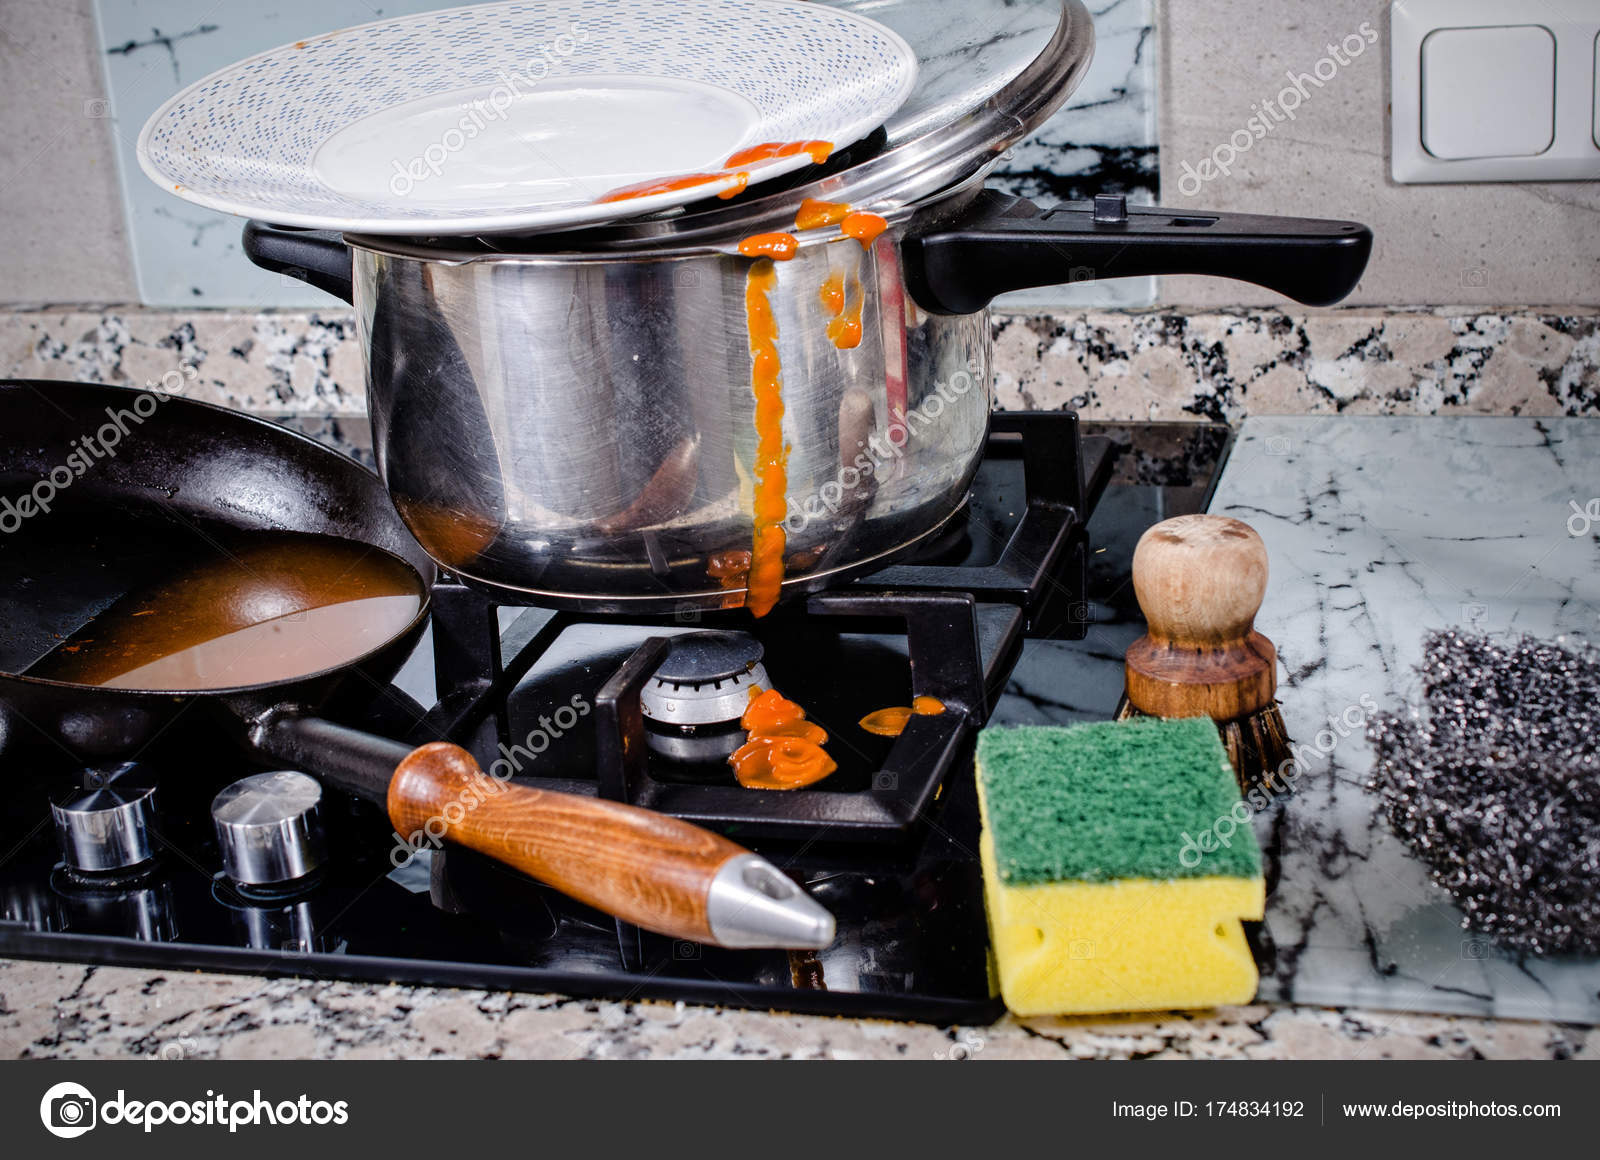 Tampo De Cozinha Desarrumado Stock Photo Olafspeier 174834192